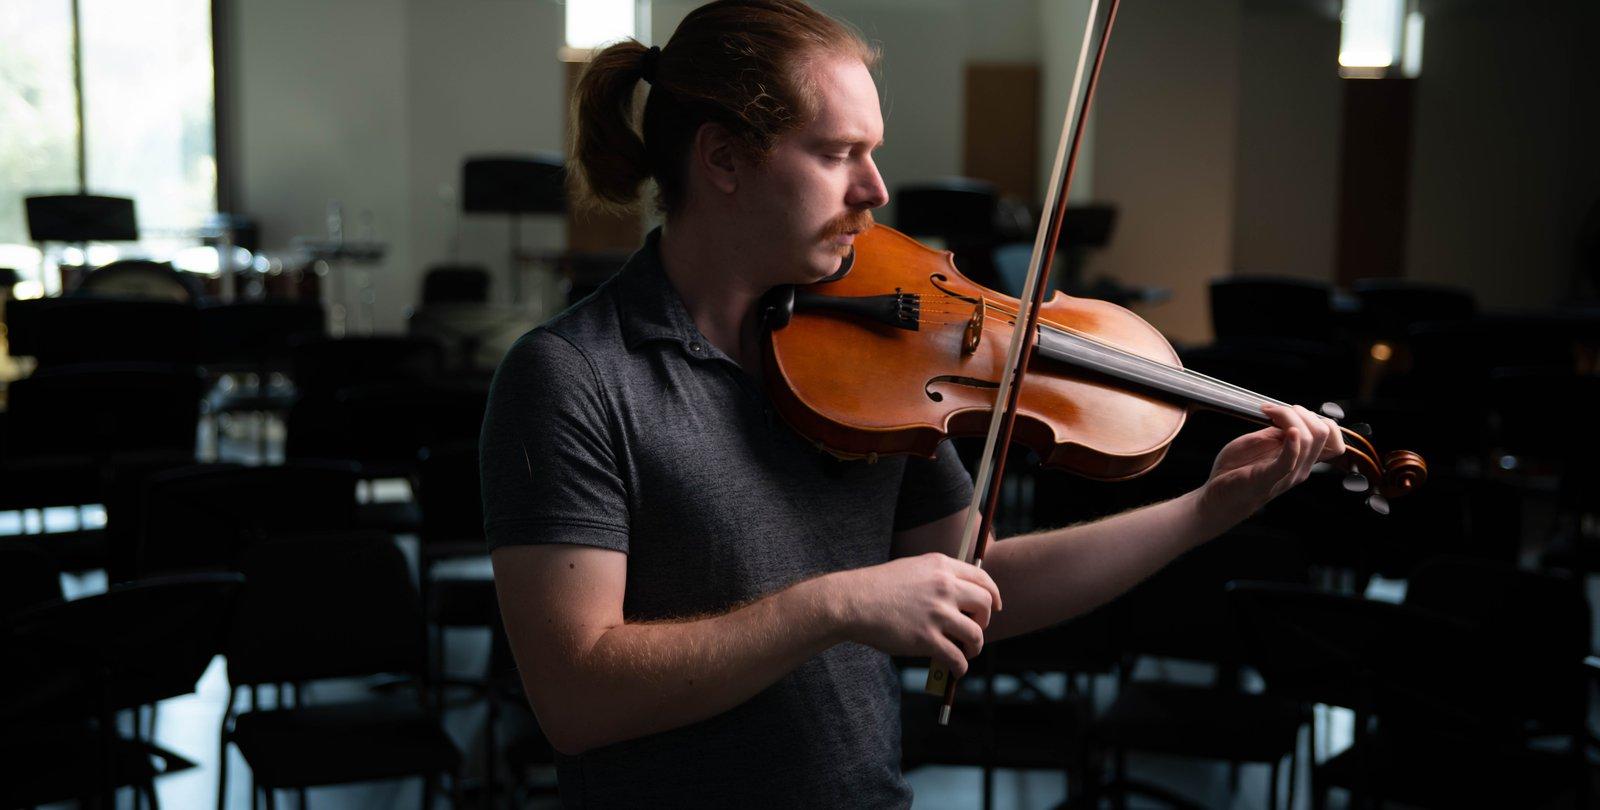 Viola player Sean Byrne